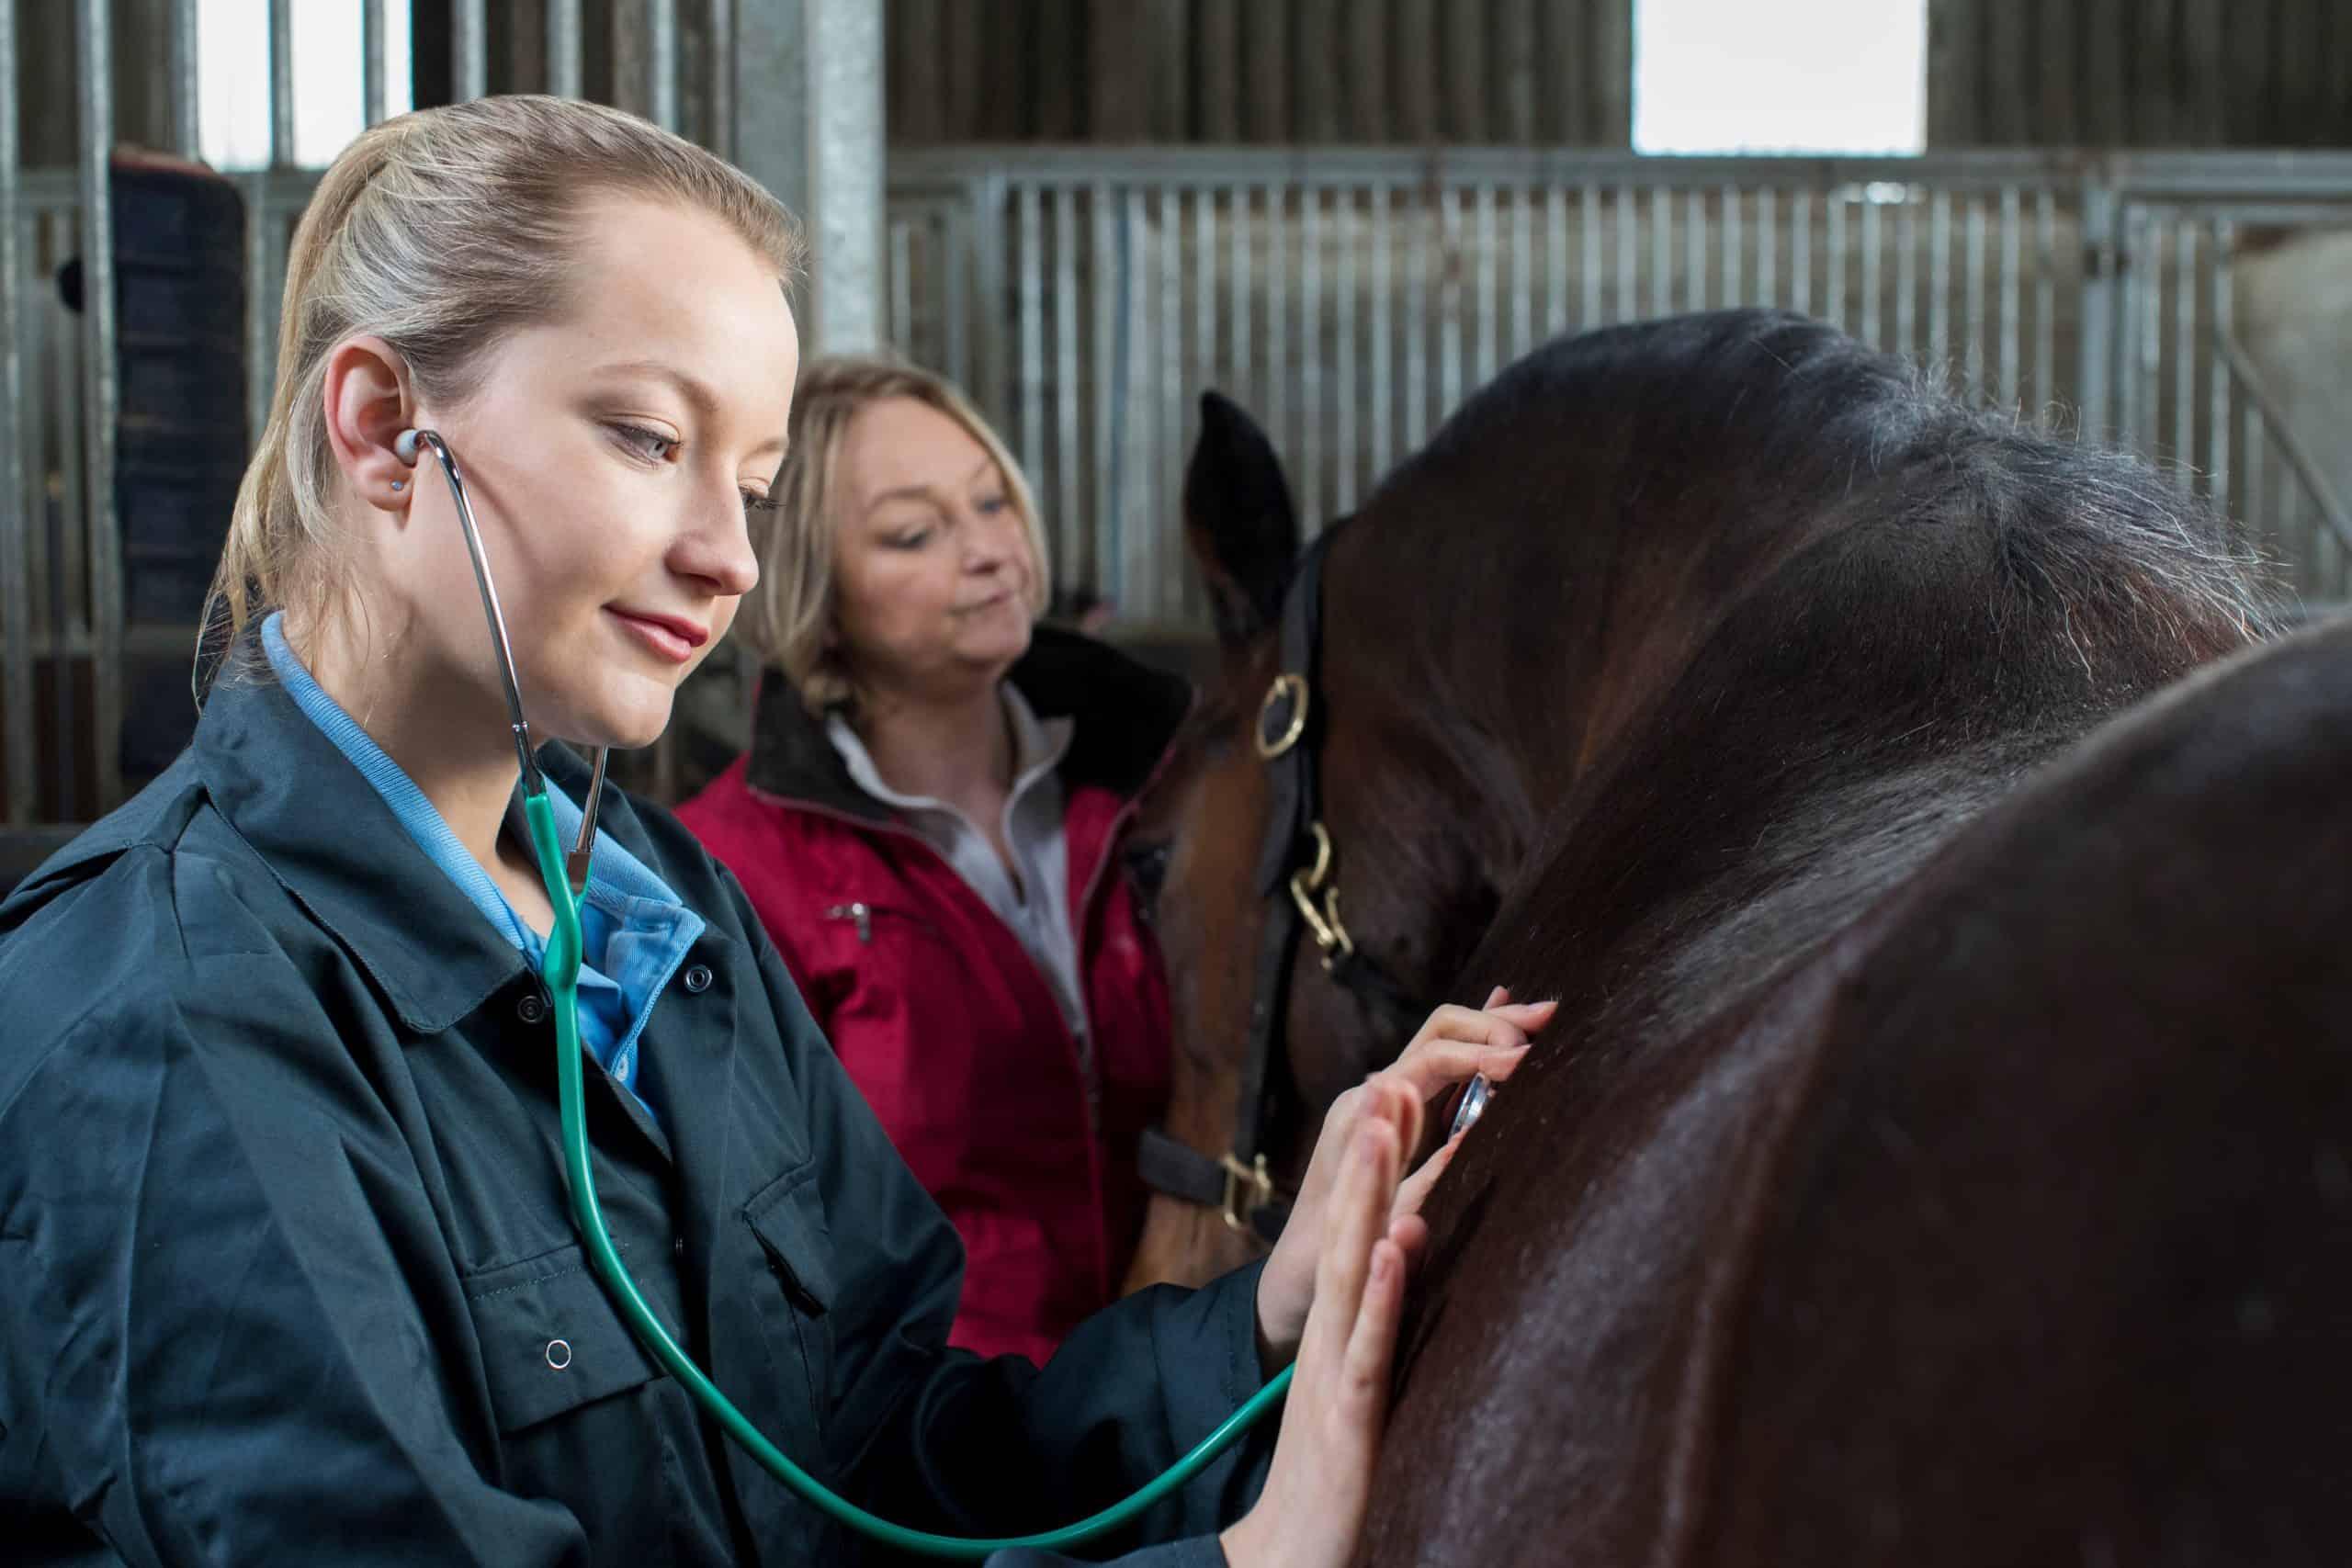 Female Vet Giving Medical Exam To Horse In Stable help horse live longer